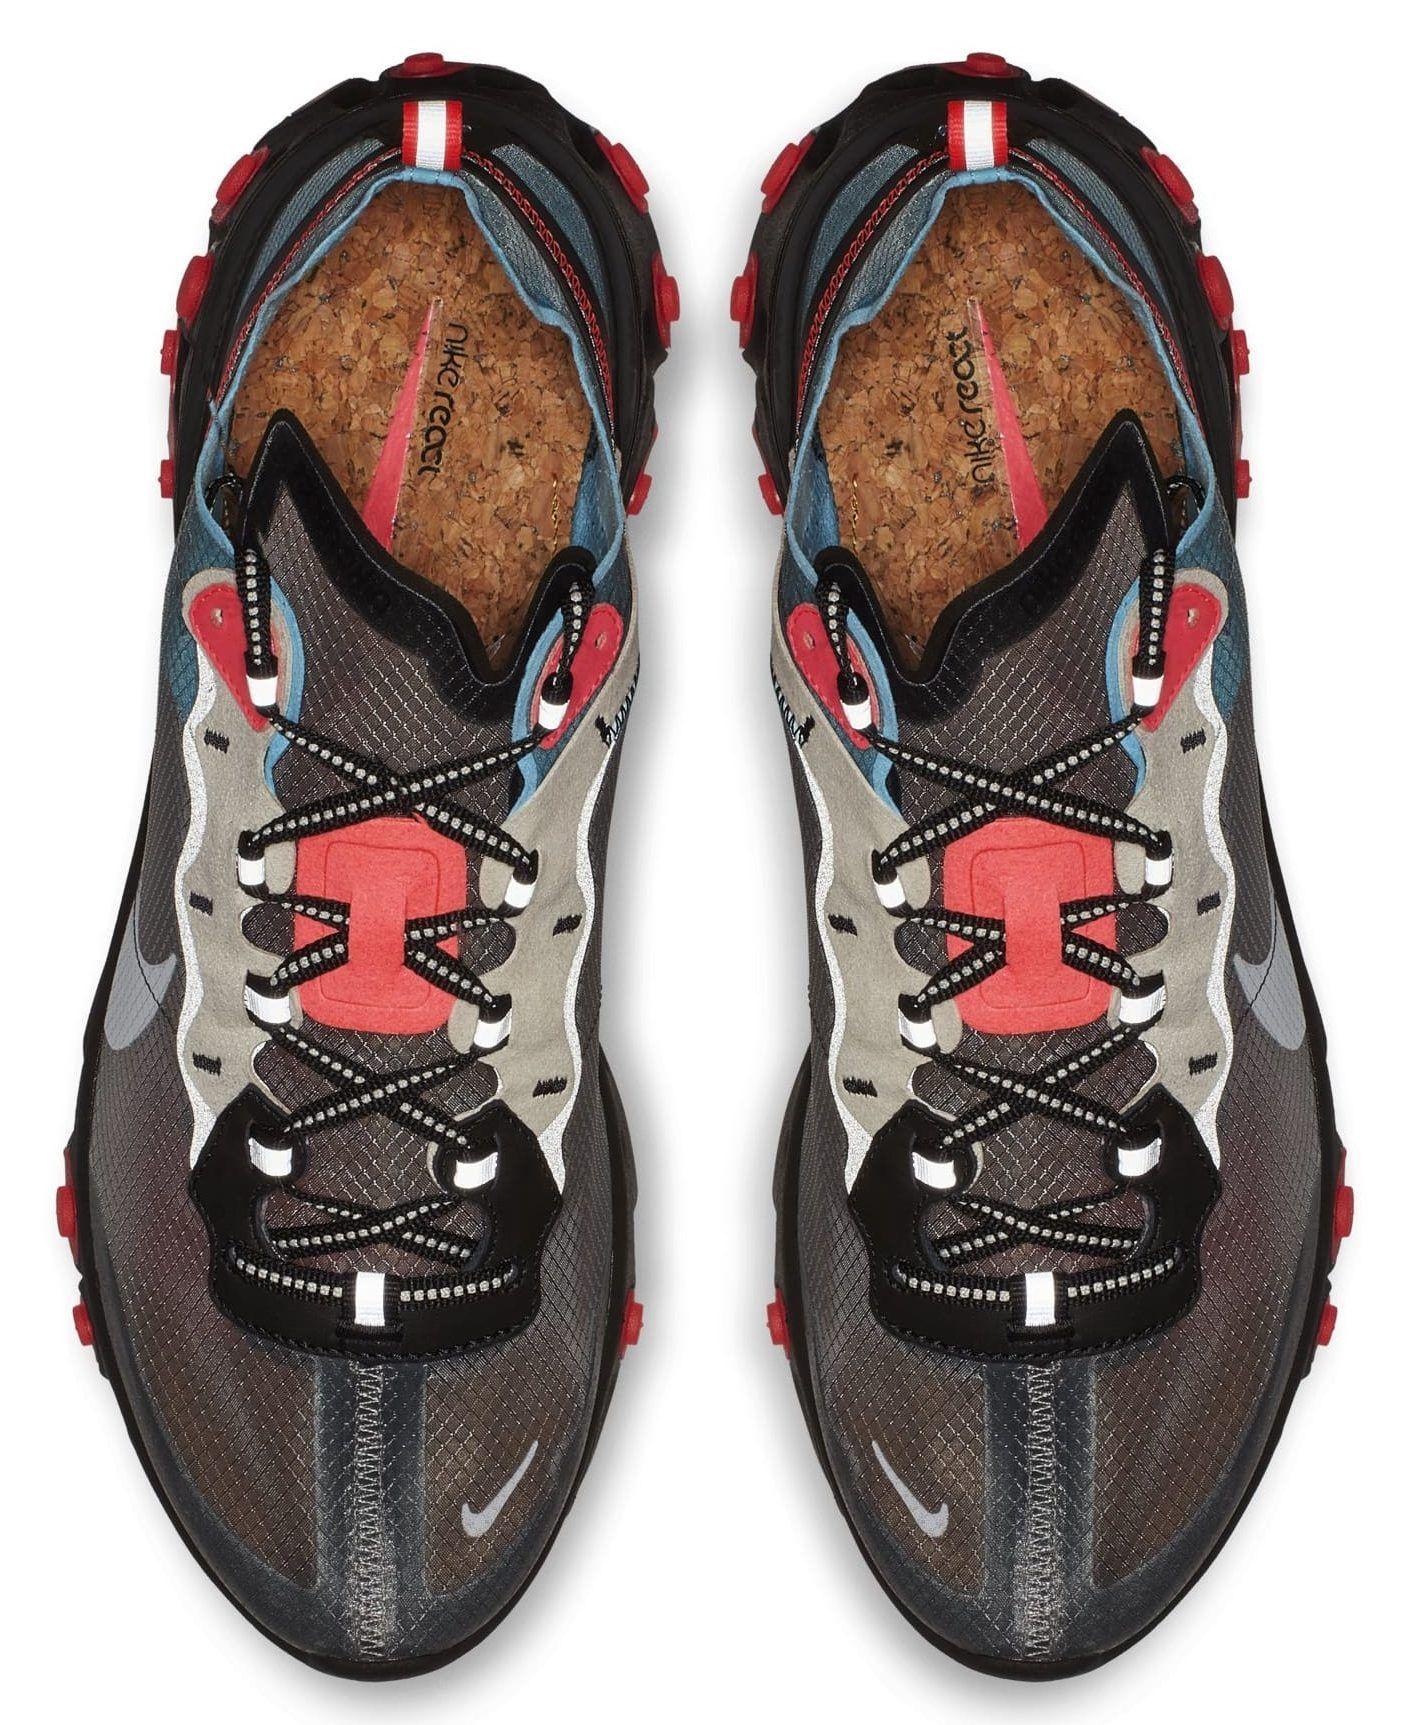 new product 0754c 51ca6 Nike React Element 87 Black Cool Grey. Nike React Element 87 Black Cool  Grey Release Date, Trainers, Kicks, Sweatshirt